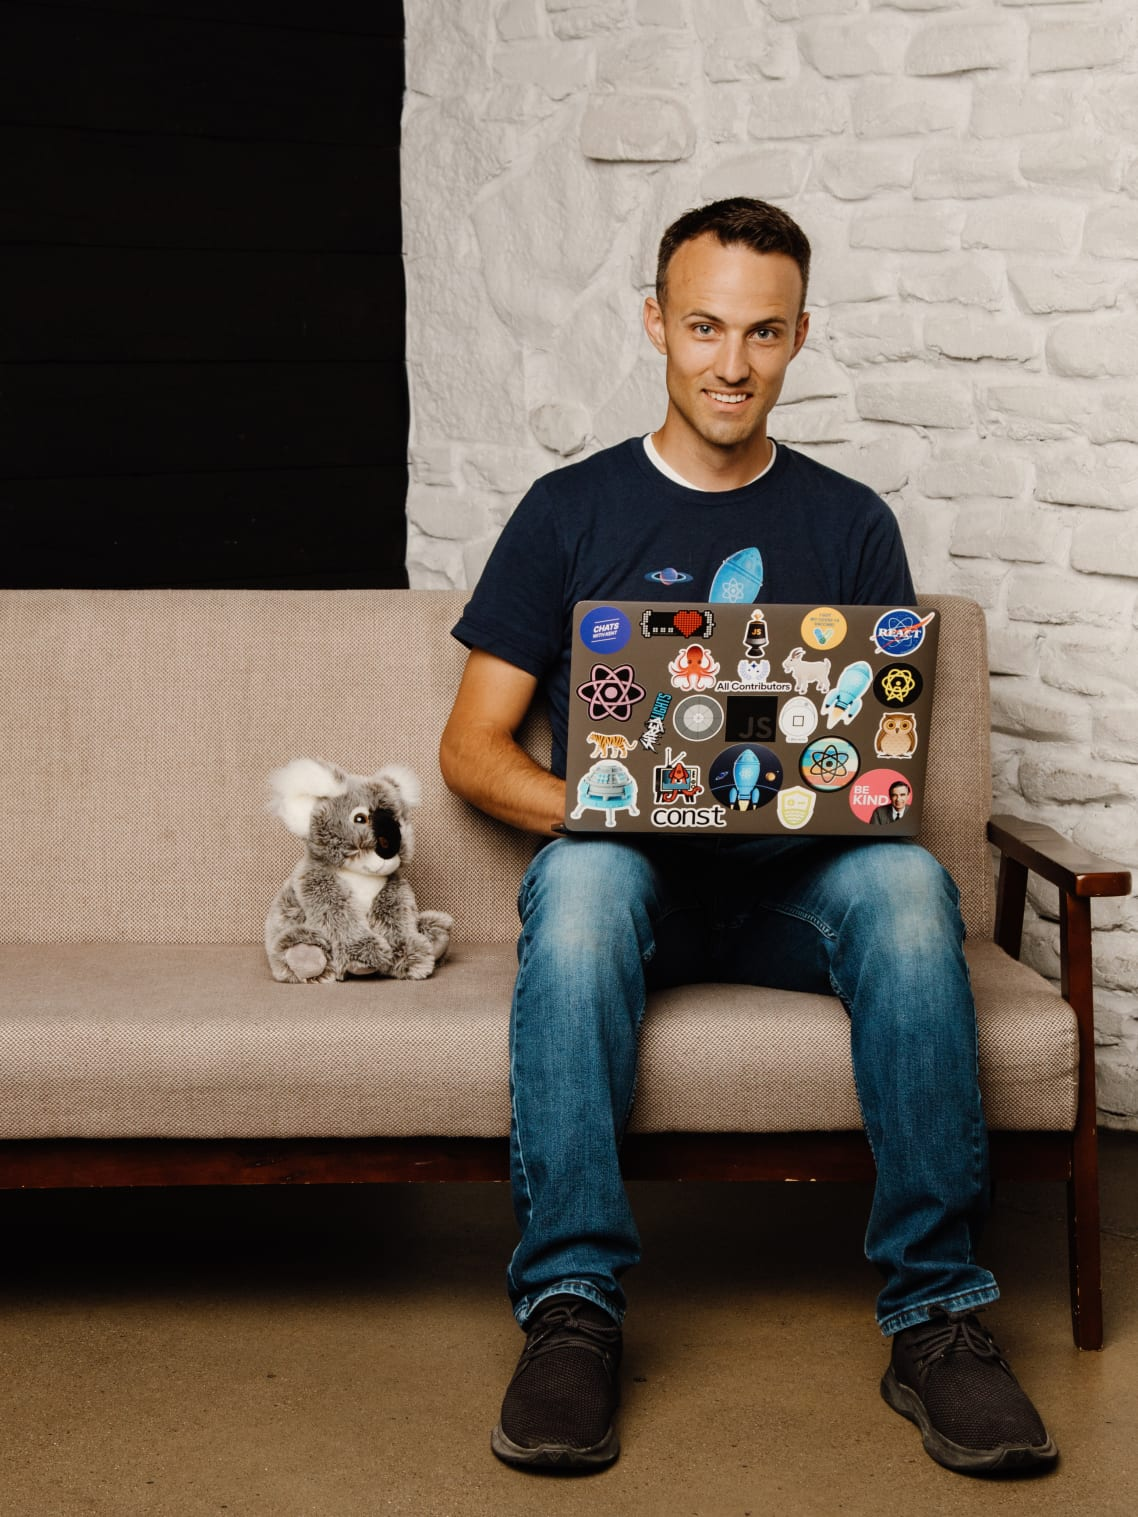 Kent sitting with his laptop on a bench next to Kody the Koala